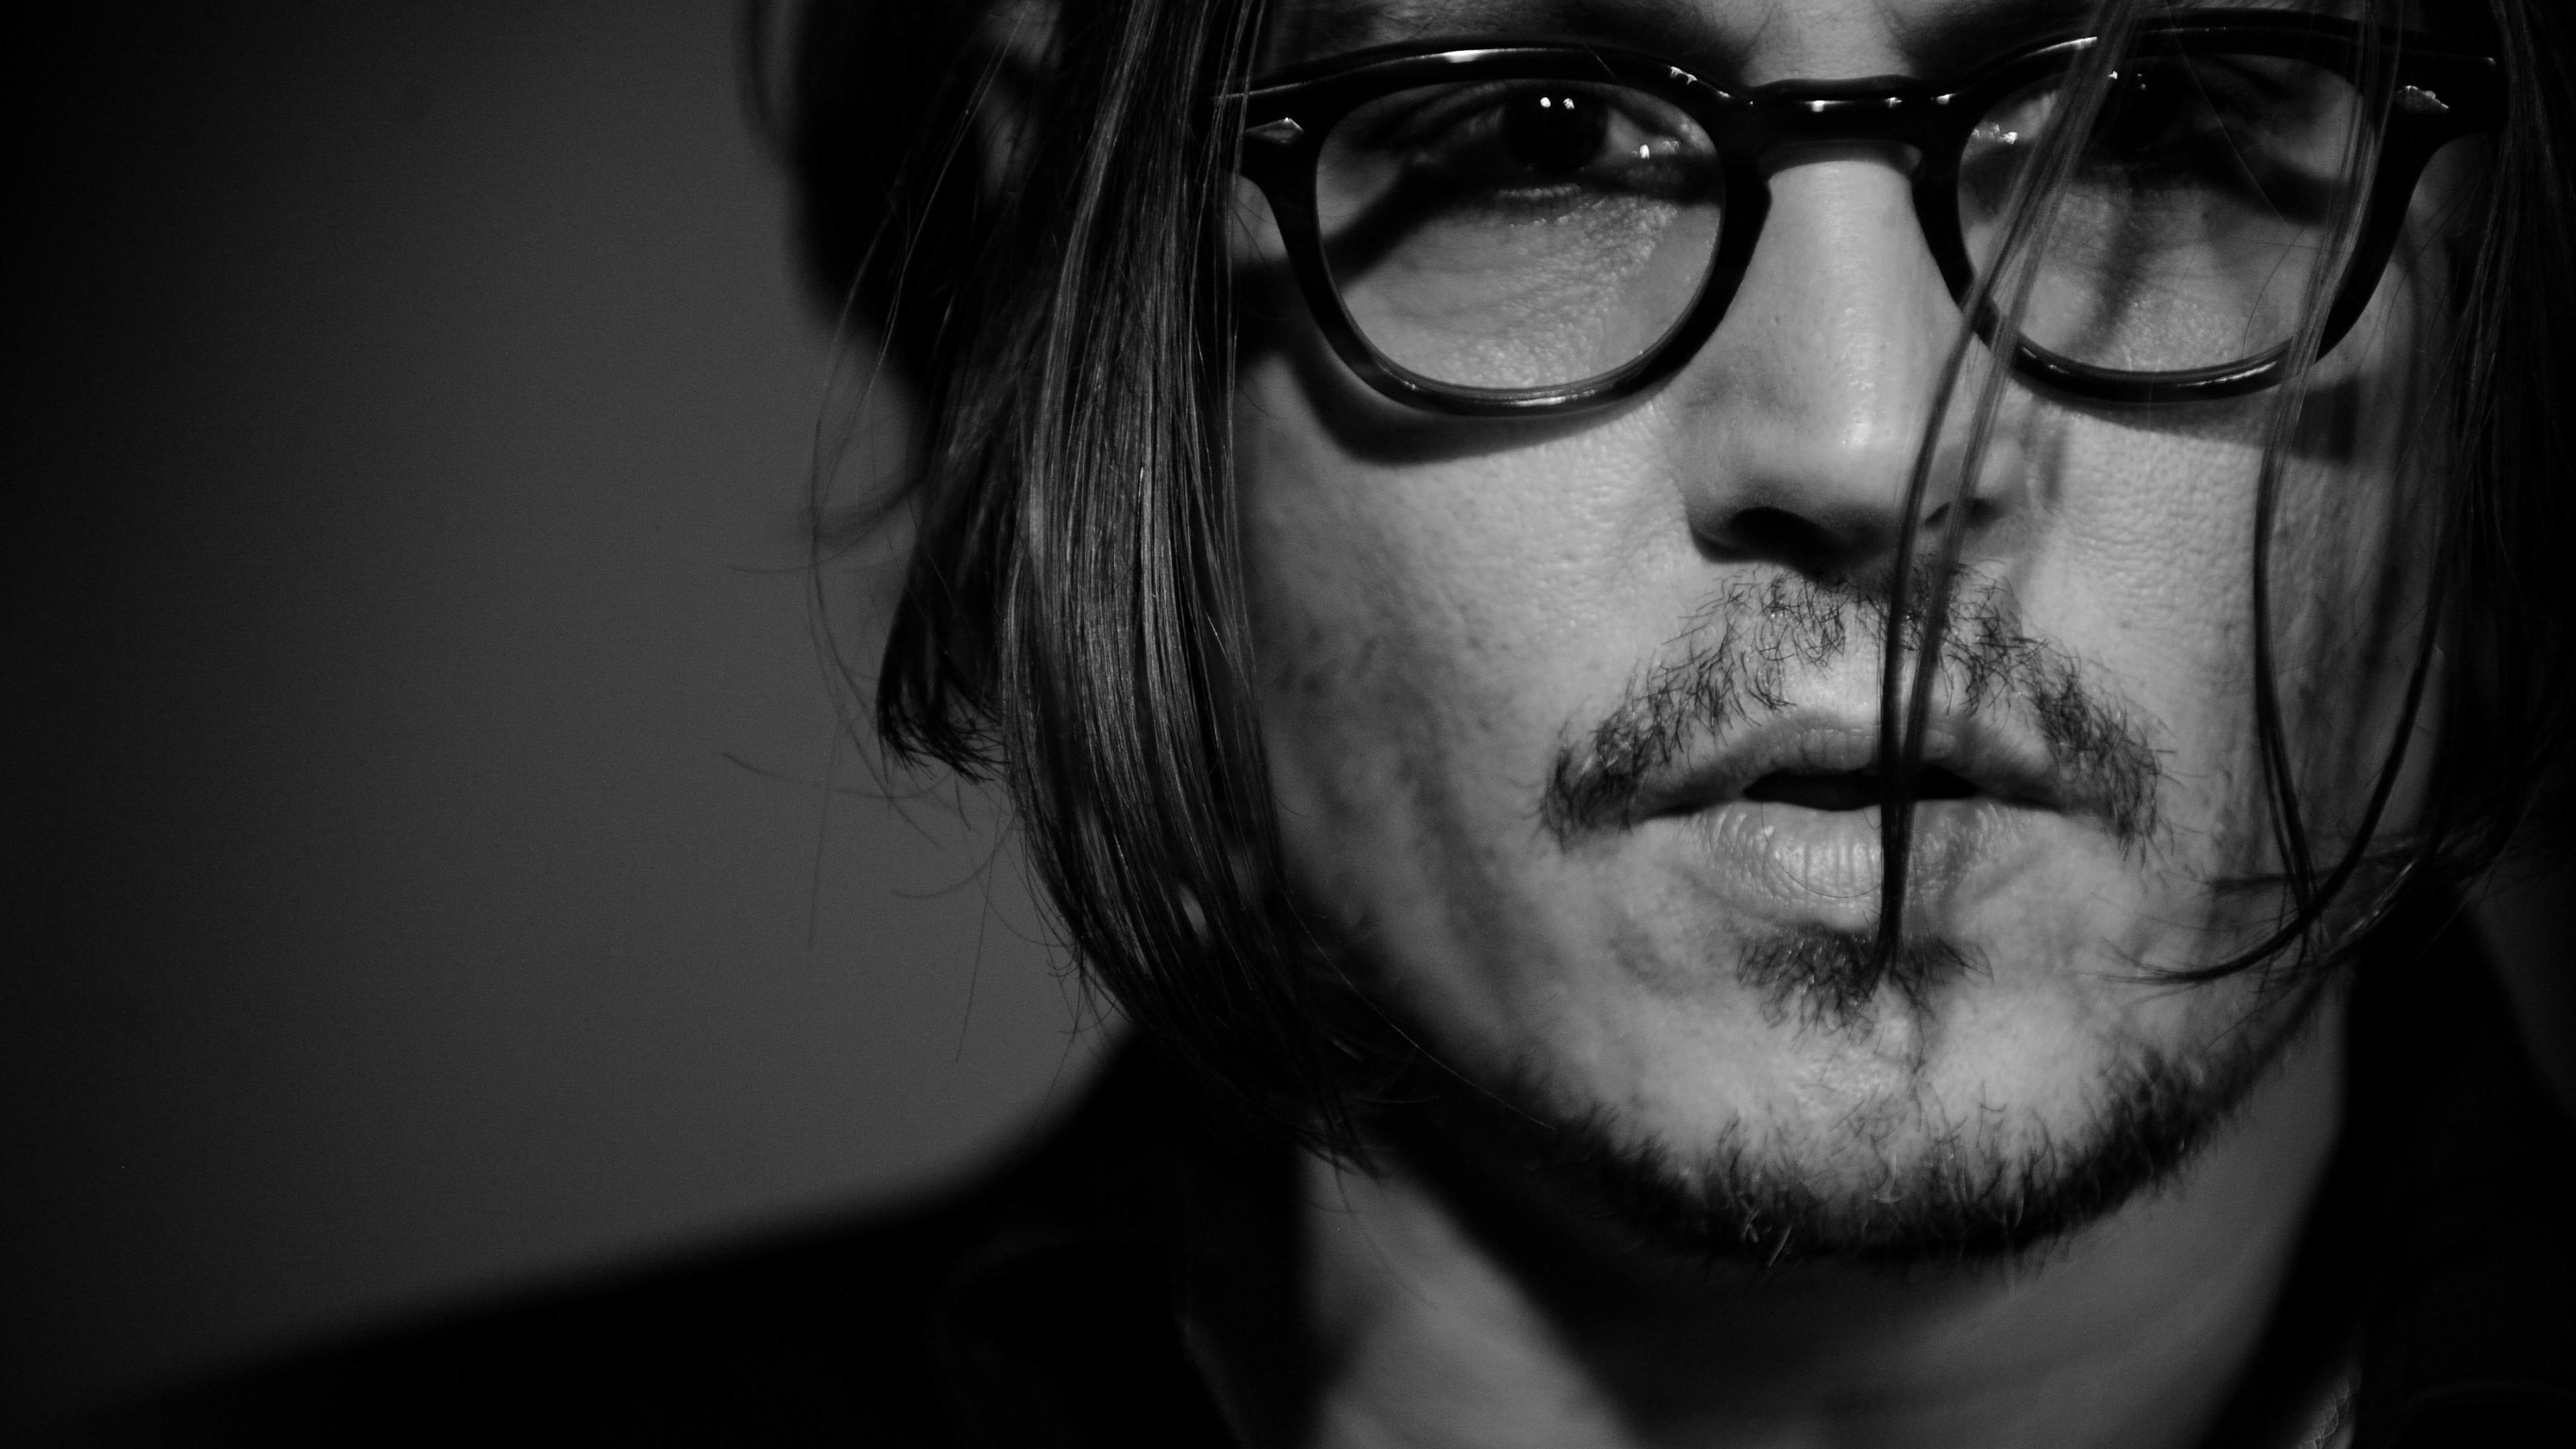 Wallpaper Johnny Depp director musician screenwriter producer 3840x2160